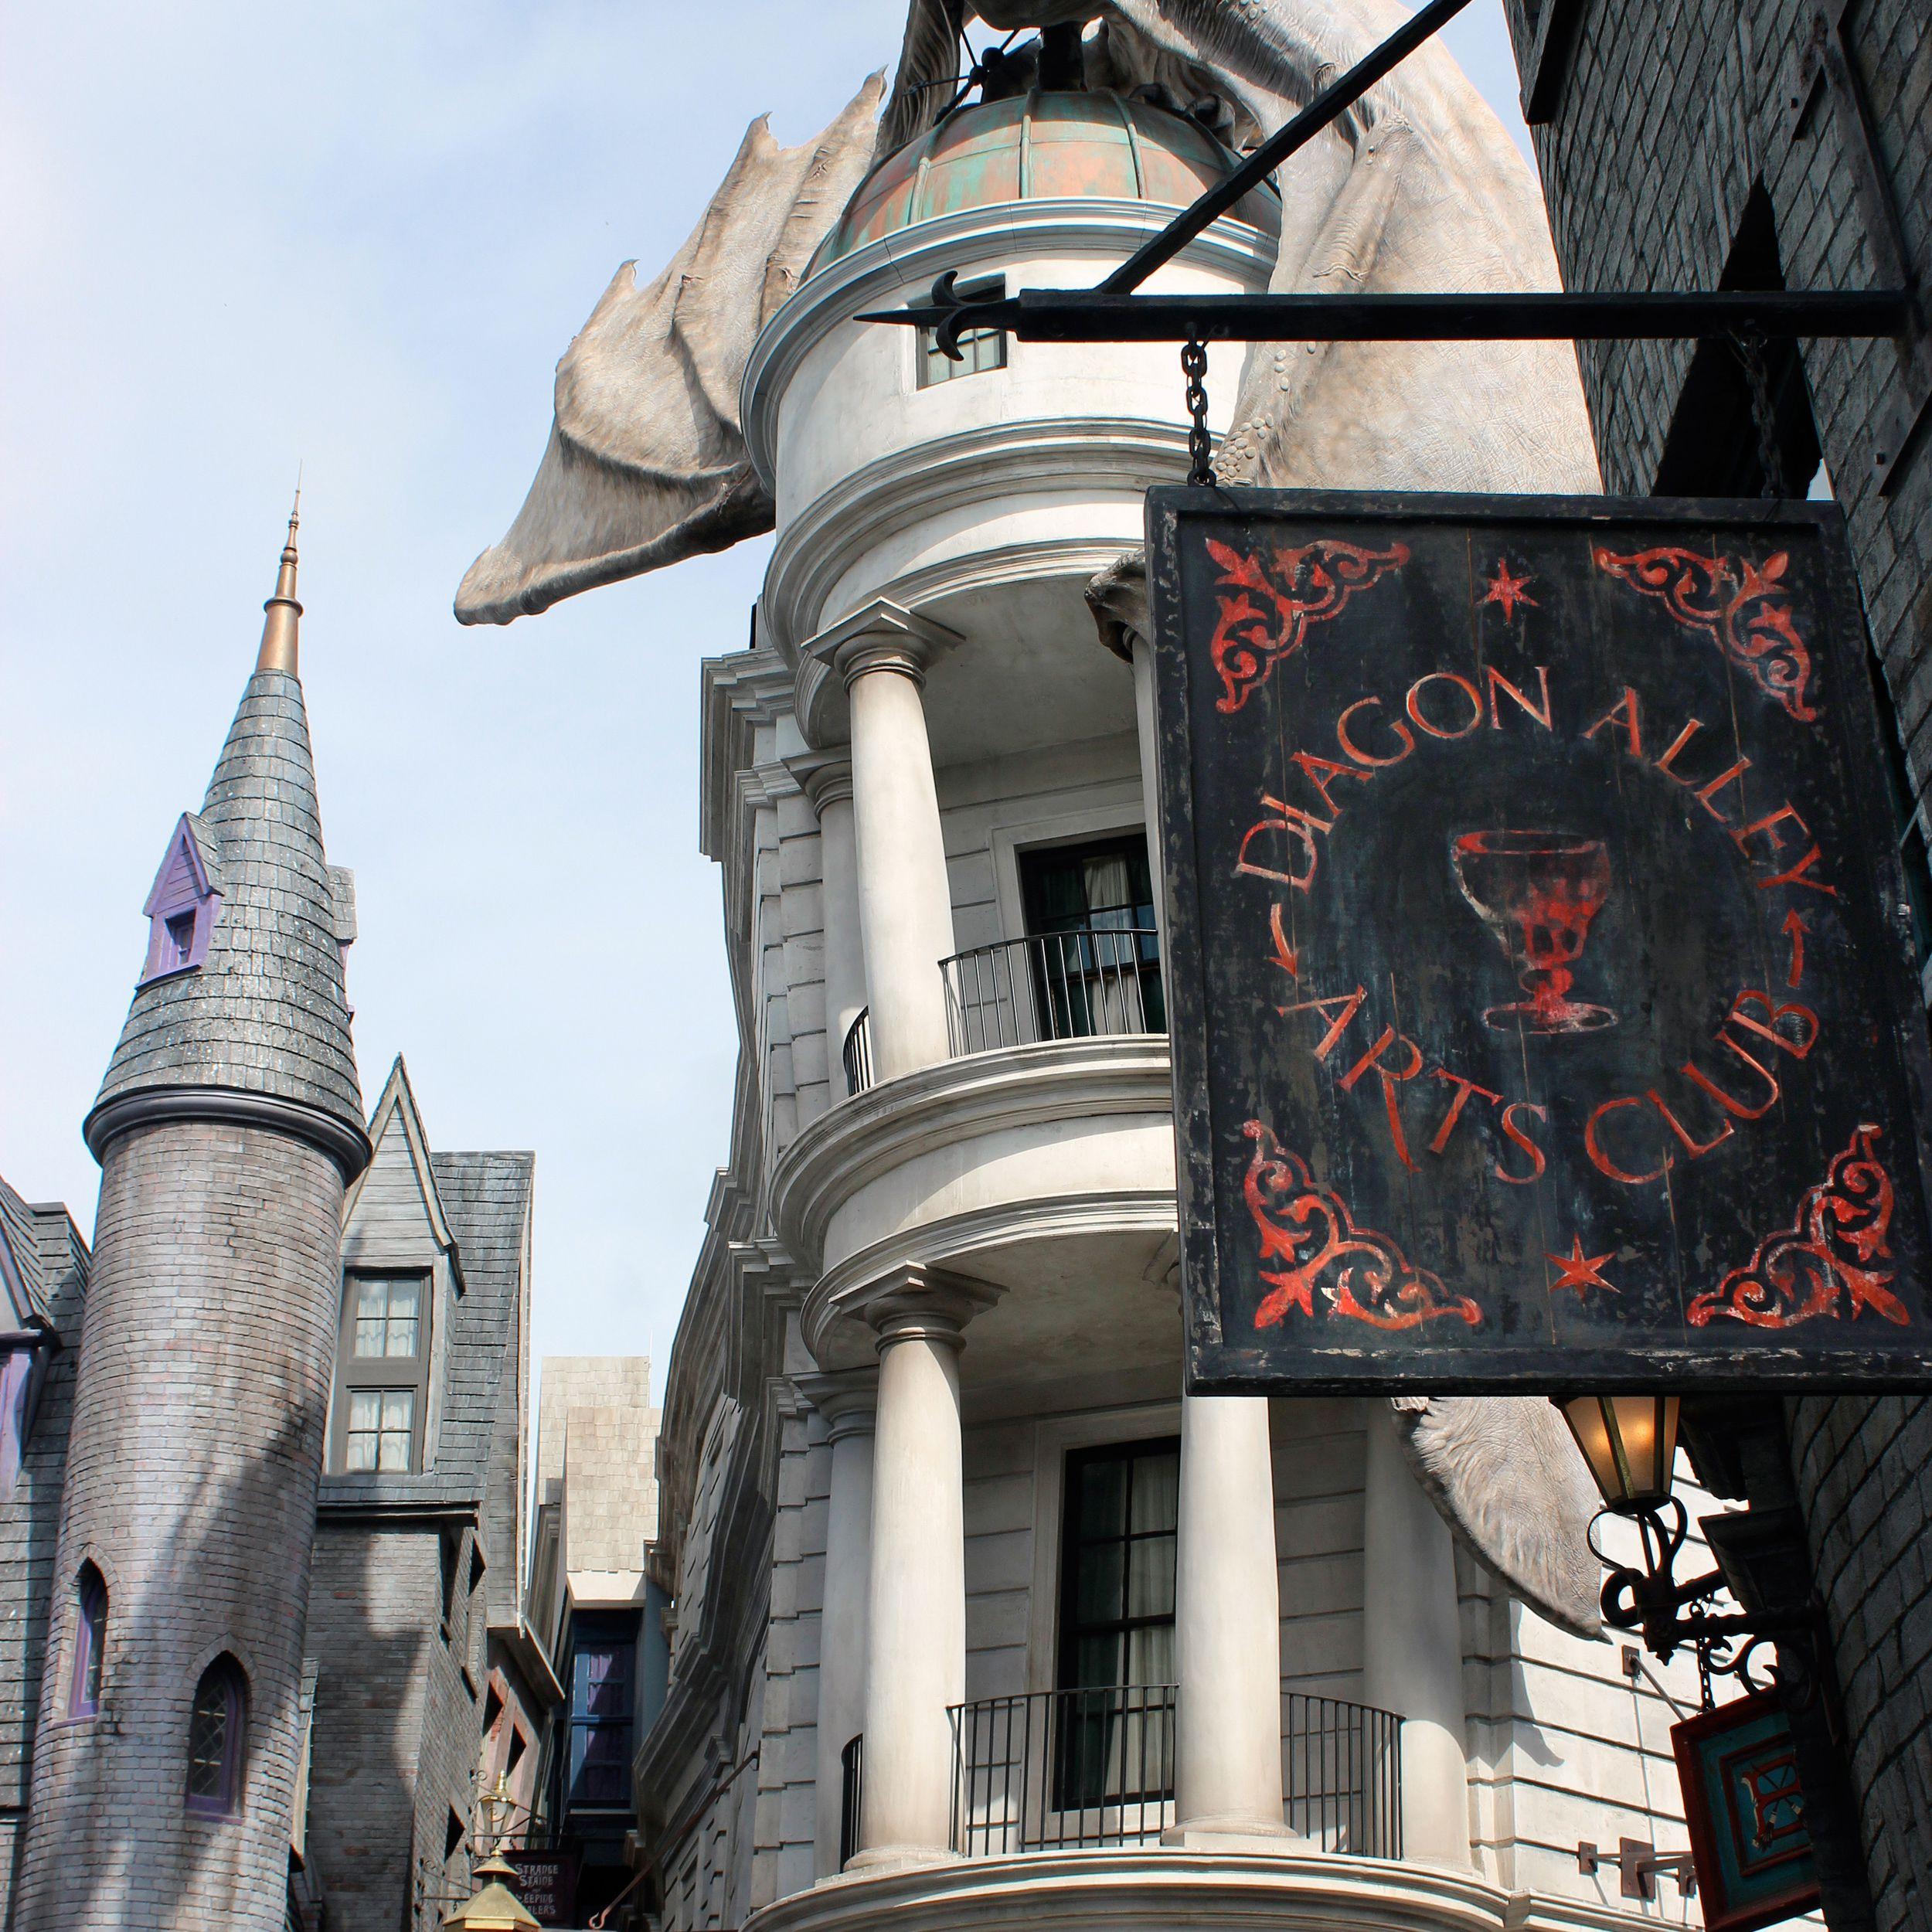 Diagon-Alley-Dragon.jpg